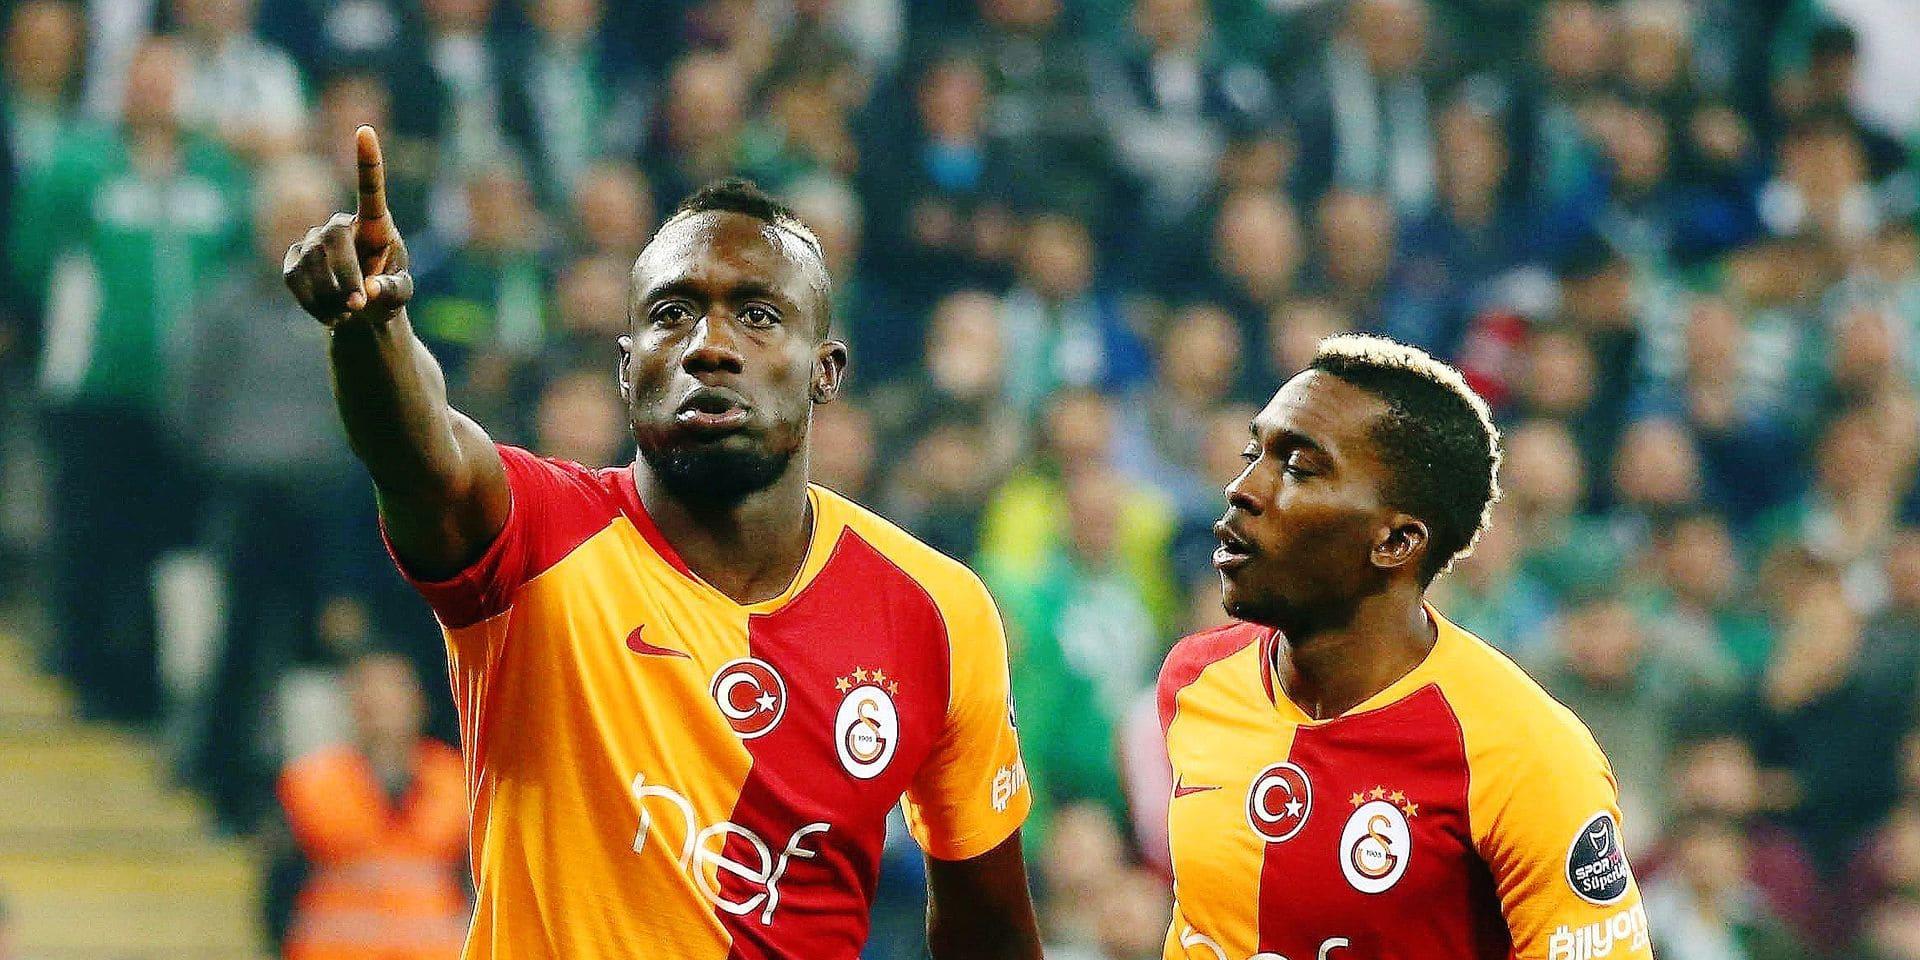 FOOTBALL : Bursaspor vs Galatasaray - Turkish Super League - 17/03/2019